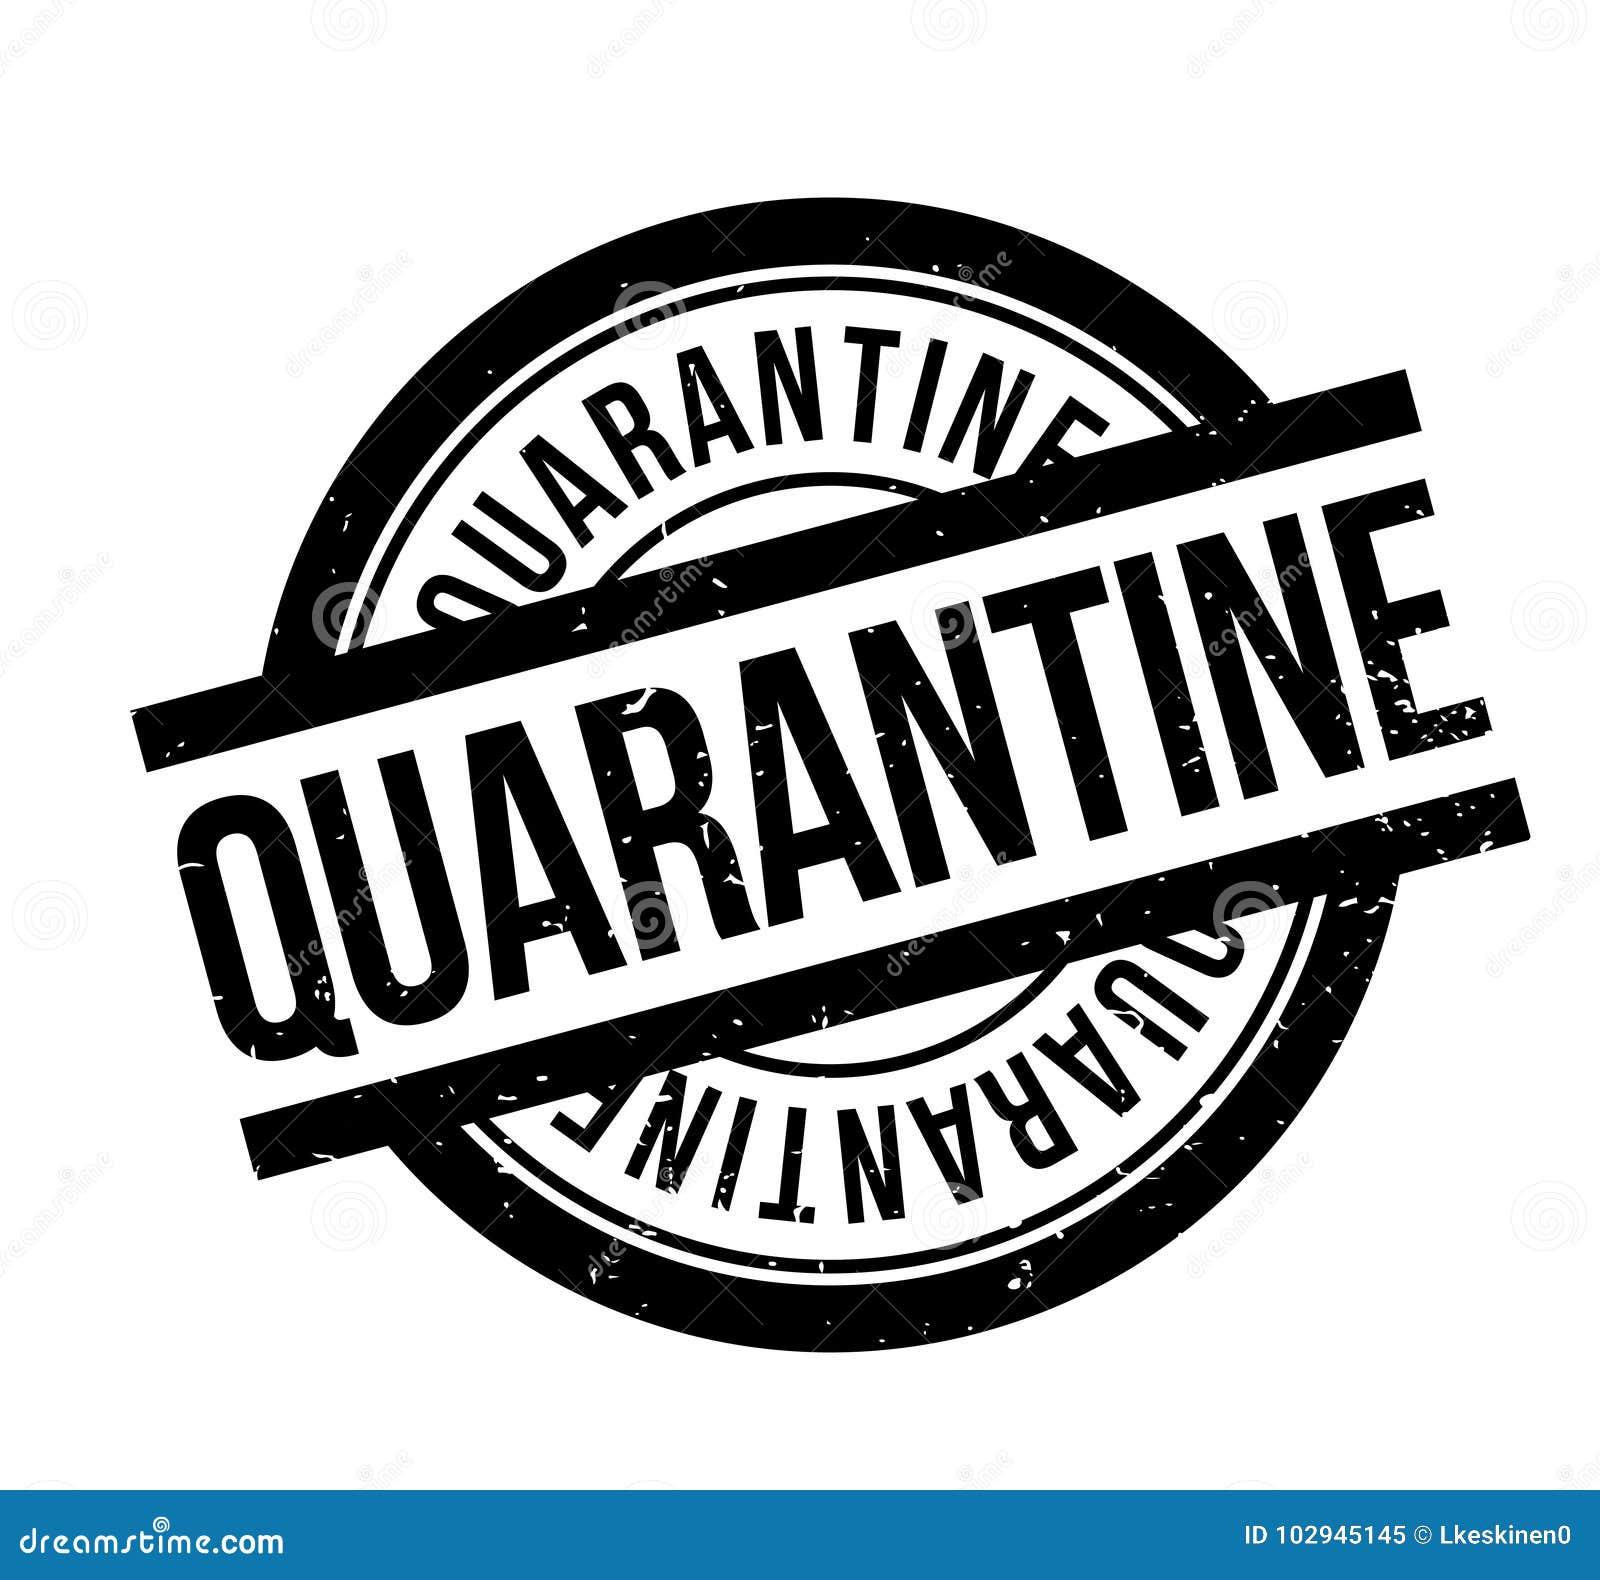 Quarantine Rubber Stamp Stock Vector Illustration Of Customs